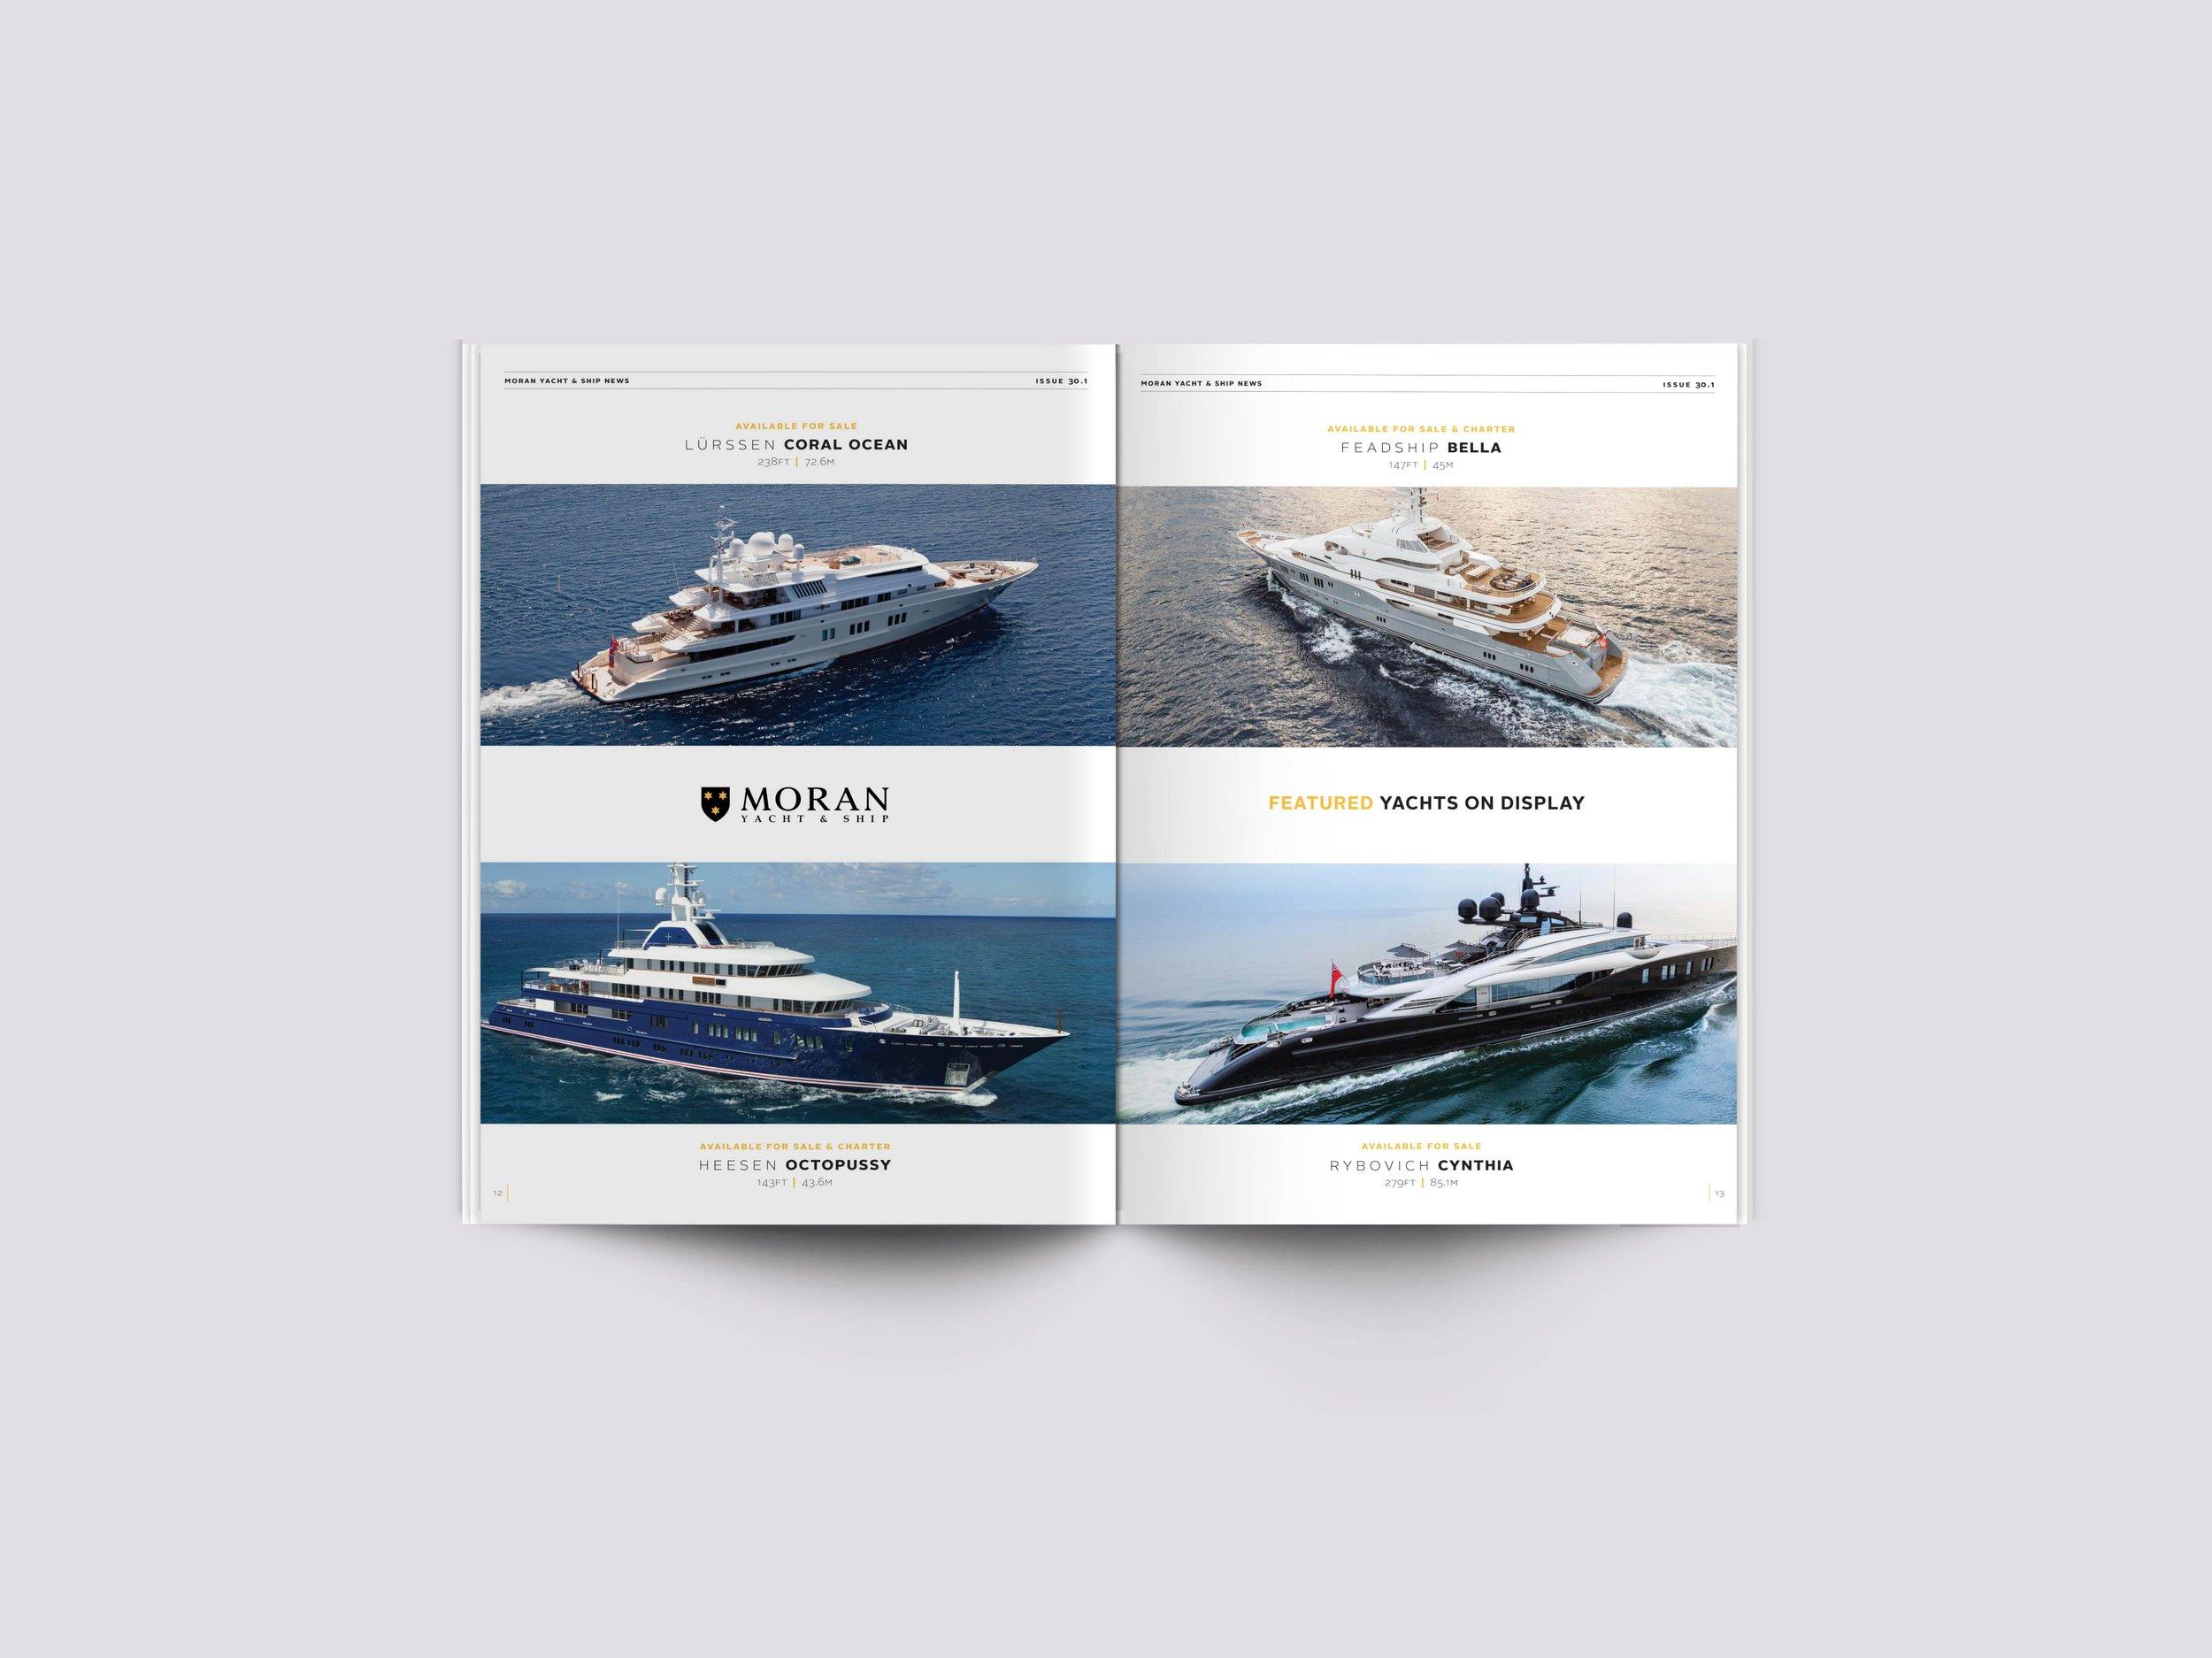 Moran-Yacht-&-Ship_Newsletter-Mockup_V4.jpg